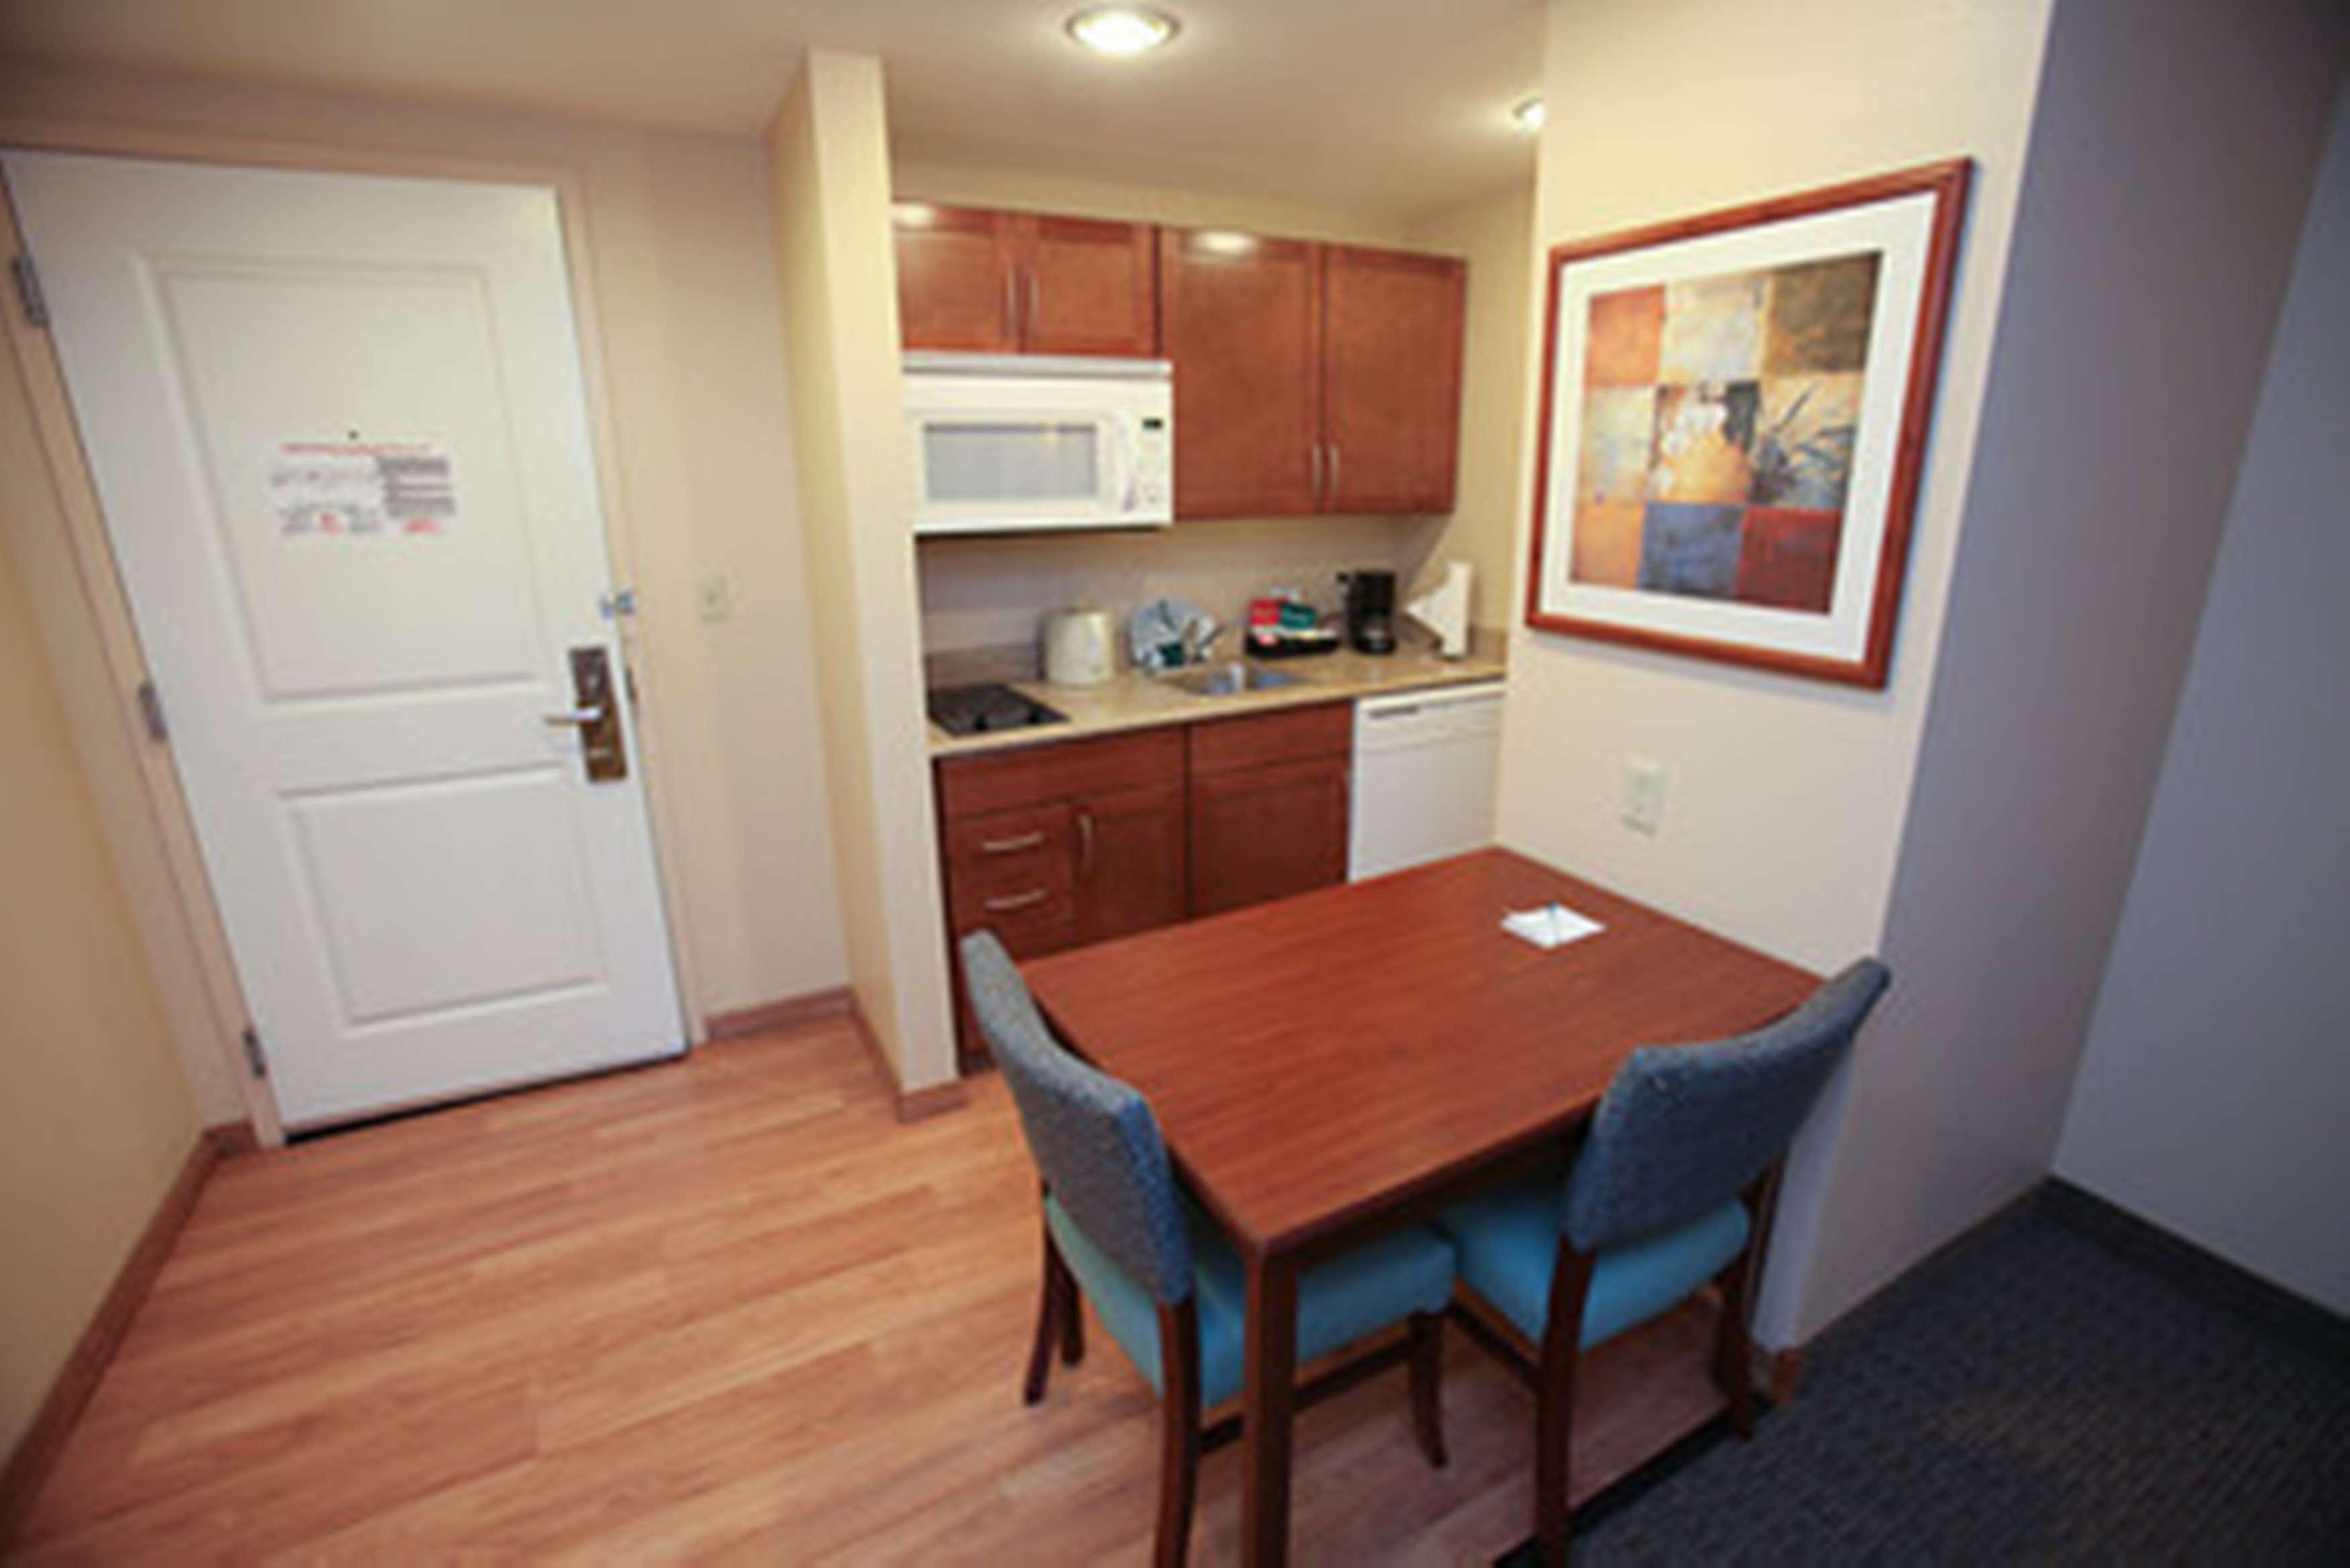 Homewood Suites by Hilton Orland Park image 17